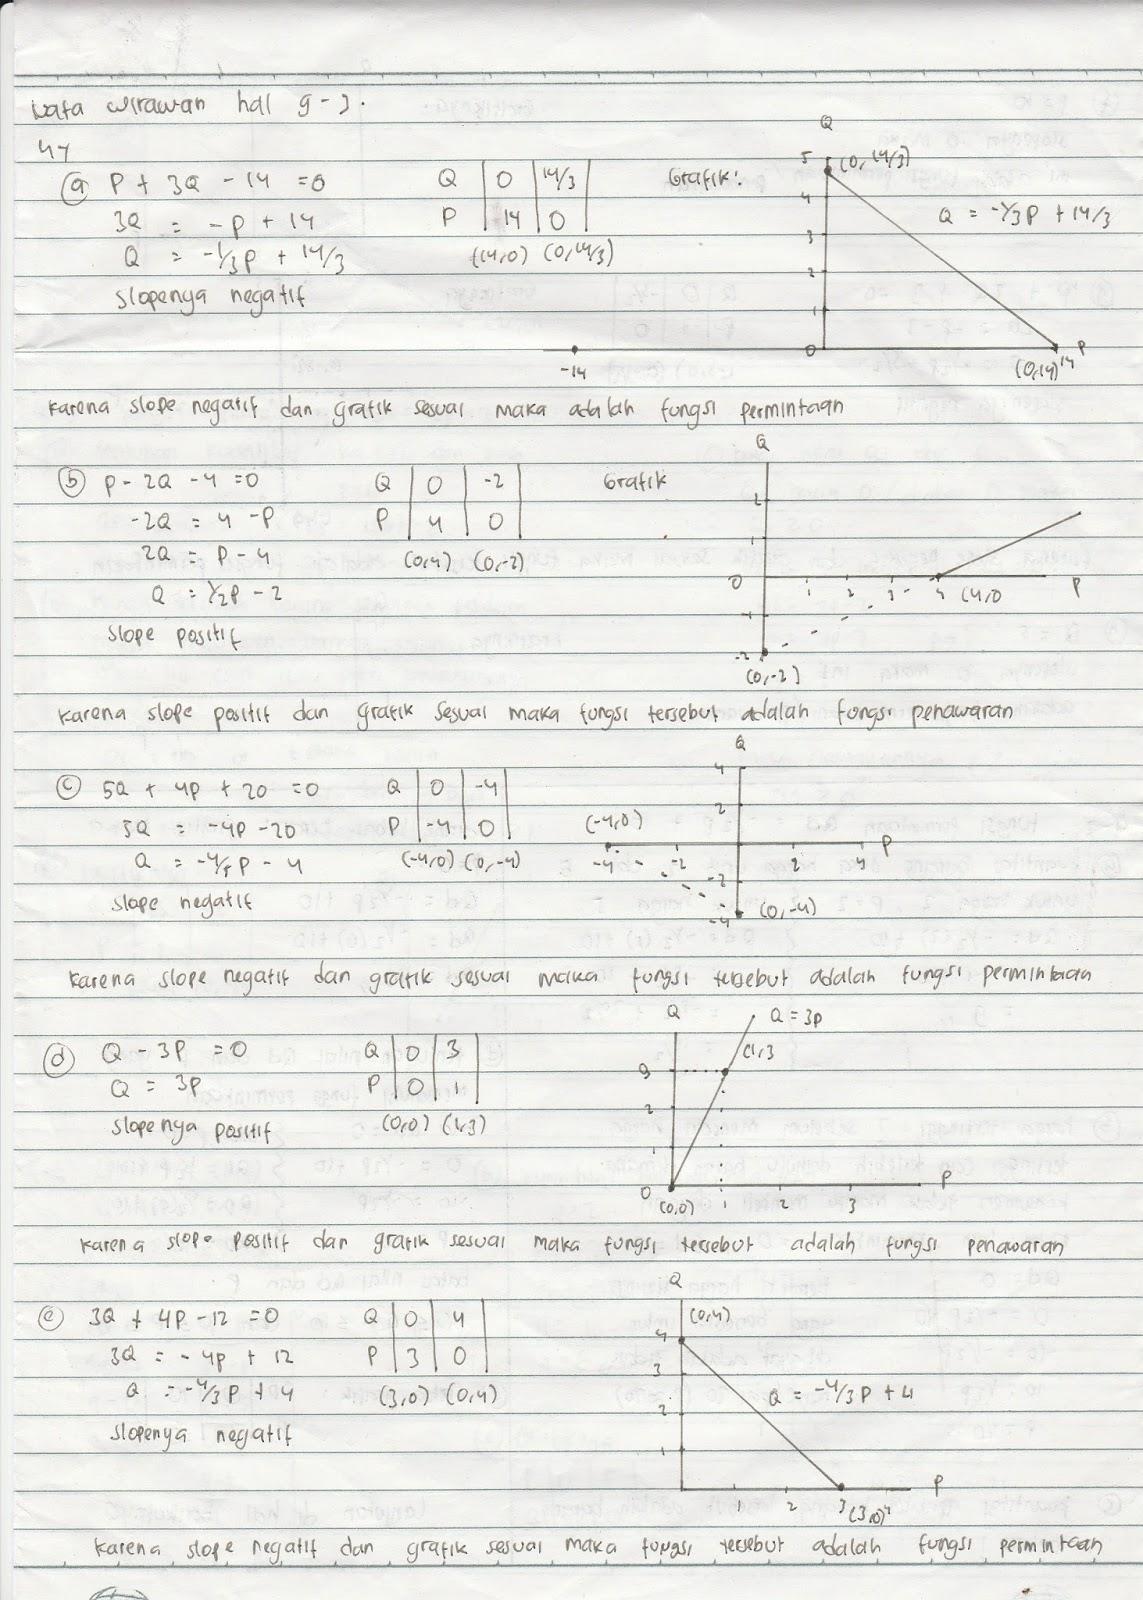 Dari buku metoda statistika oleh prof.dr.sudjana,m.a., m.sc.deskripsi lengkap. Latihan Halaman 93 Buku Matematika Ekonomi Oleh Bapak Nata Wirawan Mai Melajah